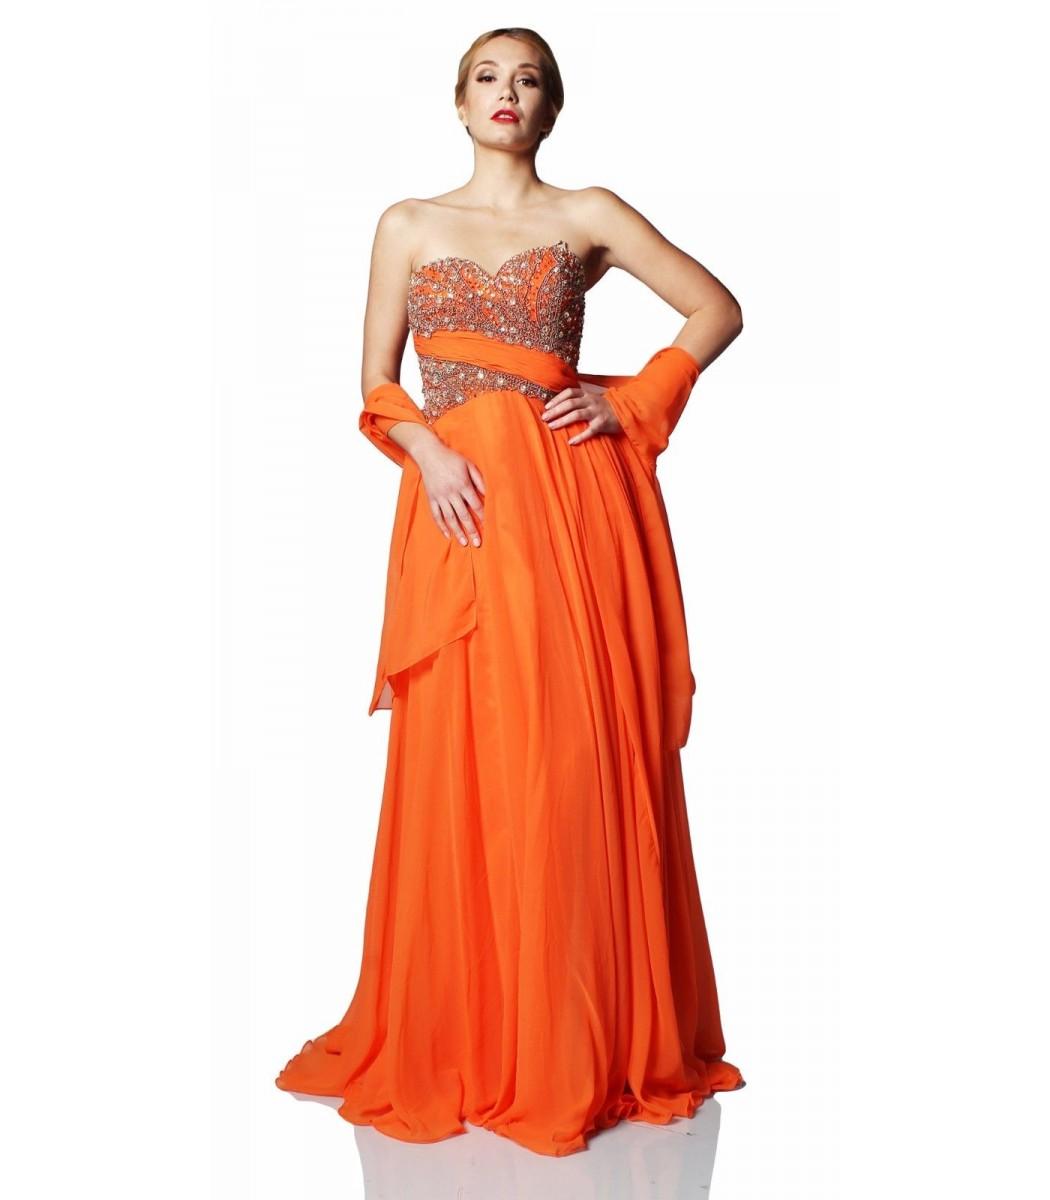 Sherri Hill 3914 Orange Strapless Formal Evening Gown SZ 8 NWT ...